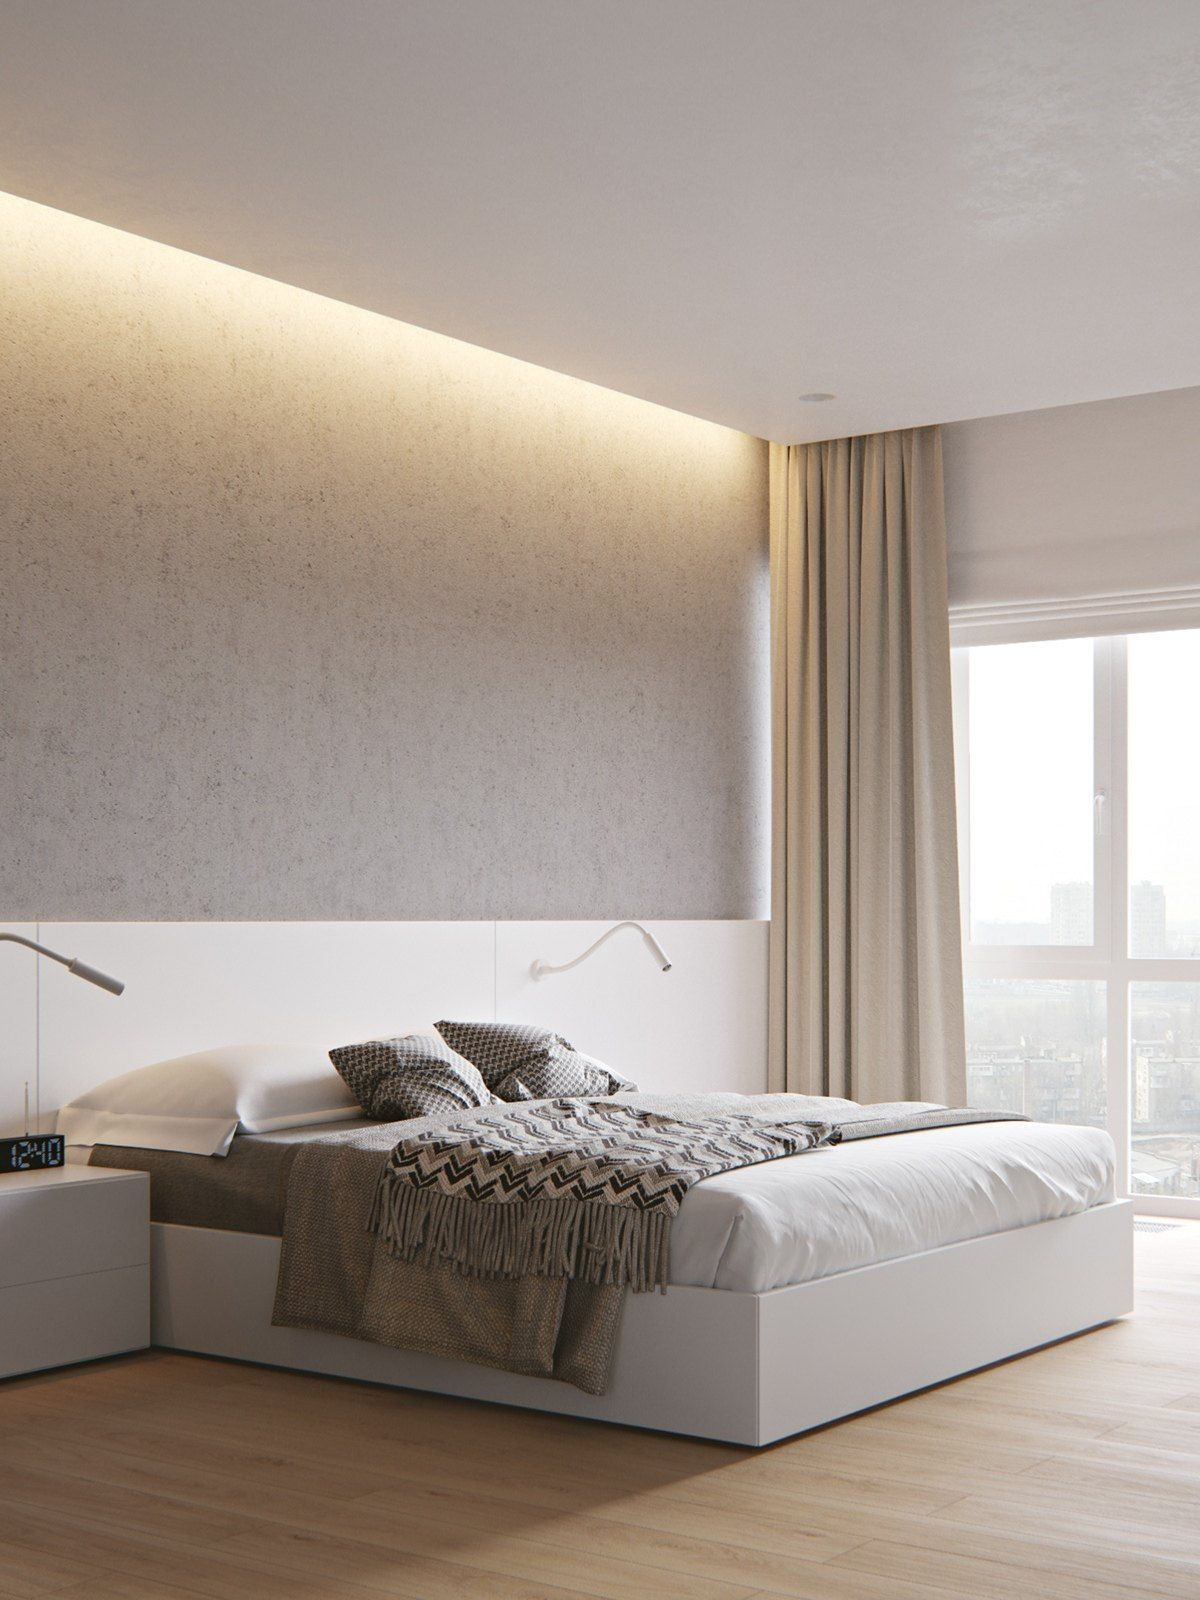 2 Homes With Similar Hues Modern Minimalist Bedroom Minimalist Home Interior Modern Bedroom